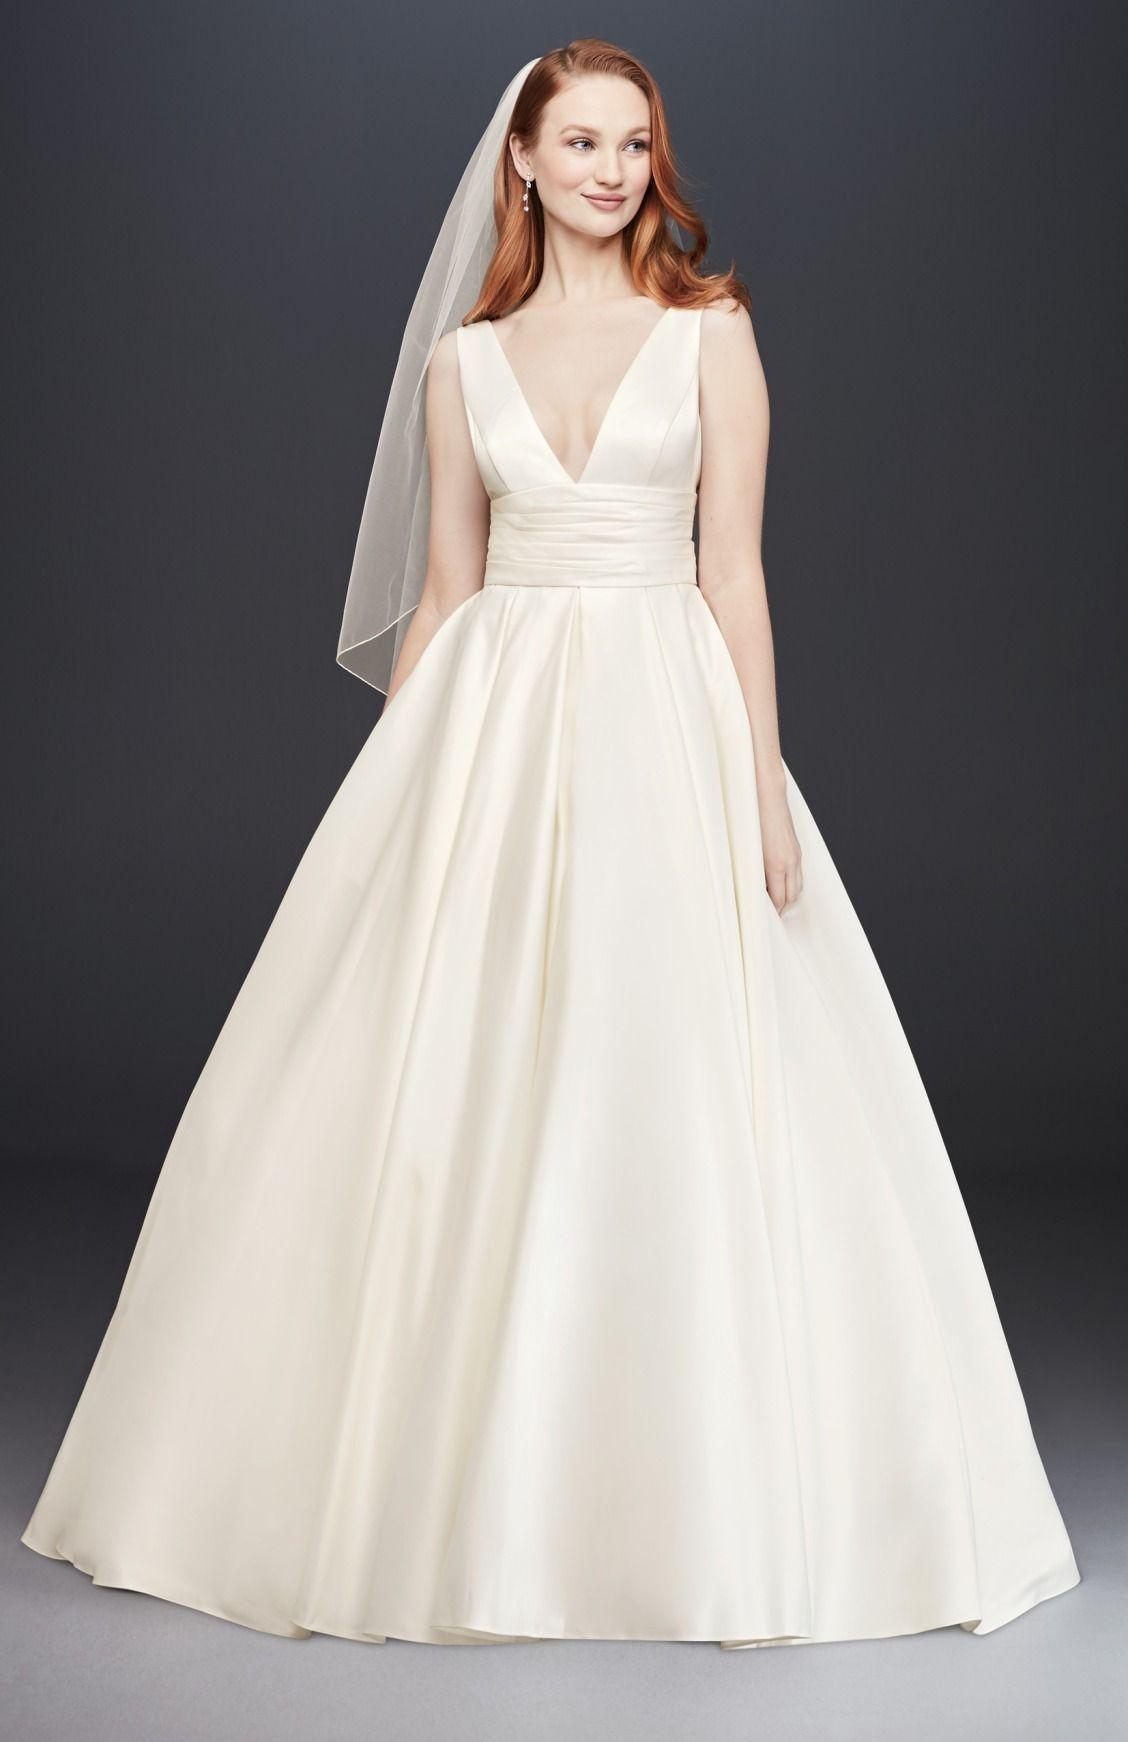 1085aa0c8b33 Satin V-Neck Cummerbund Ball Gown Wedding Dress by David's Bridal Collection  | Simple Wedding Dress